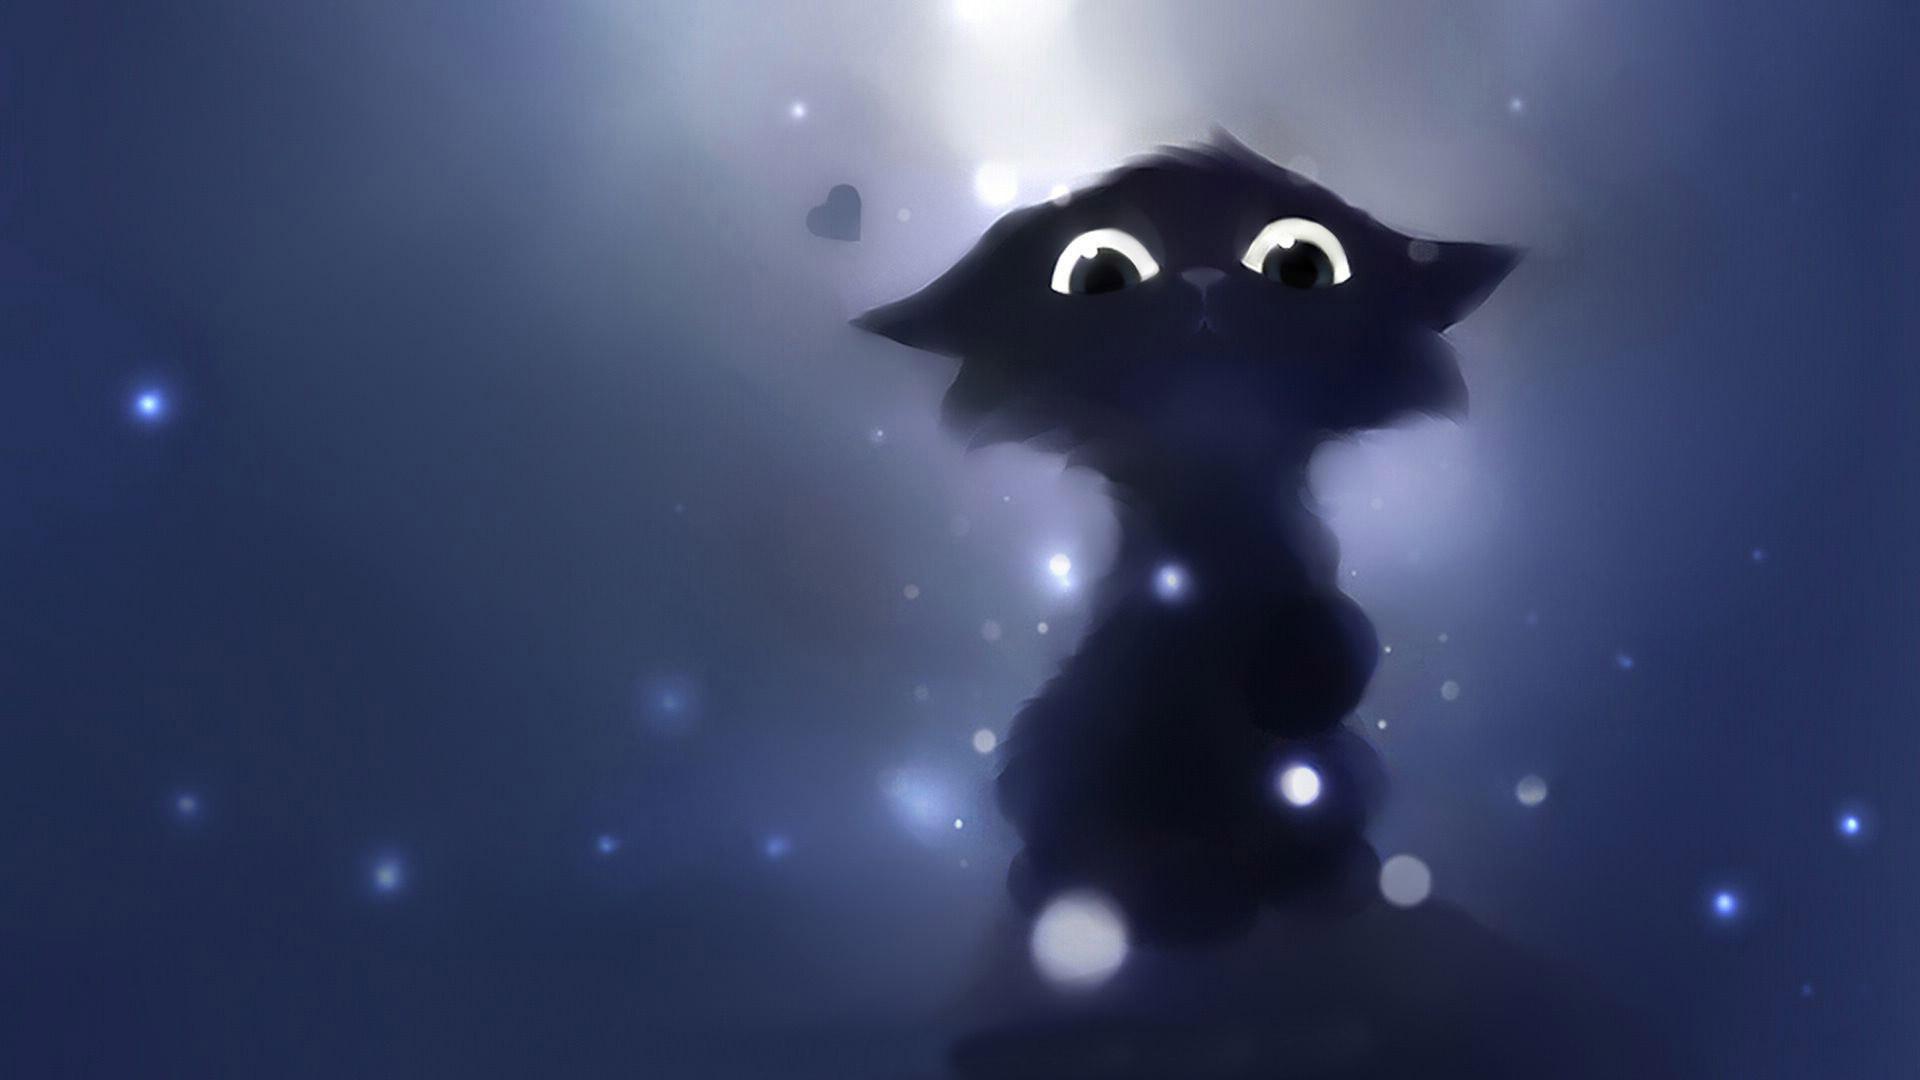 Cute Dark Wallpaper Black Cat Halloween Background 109385 Hd Wallpaper Backgrounds Download